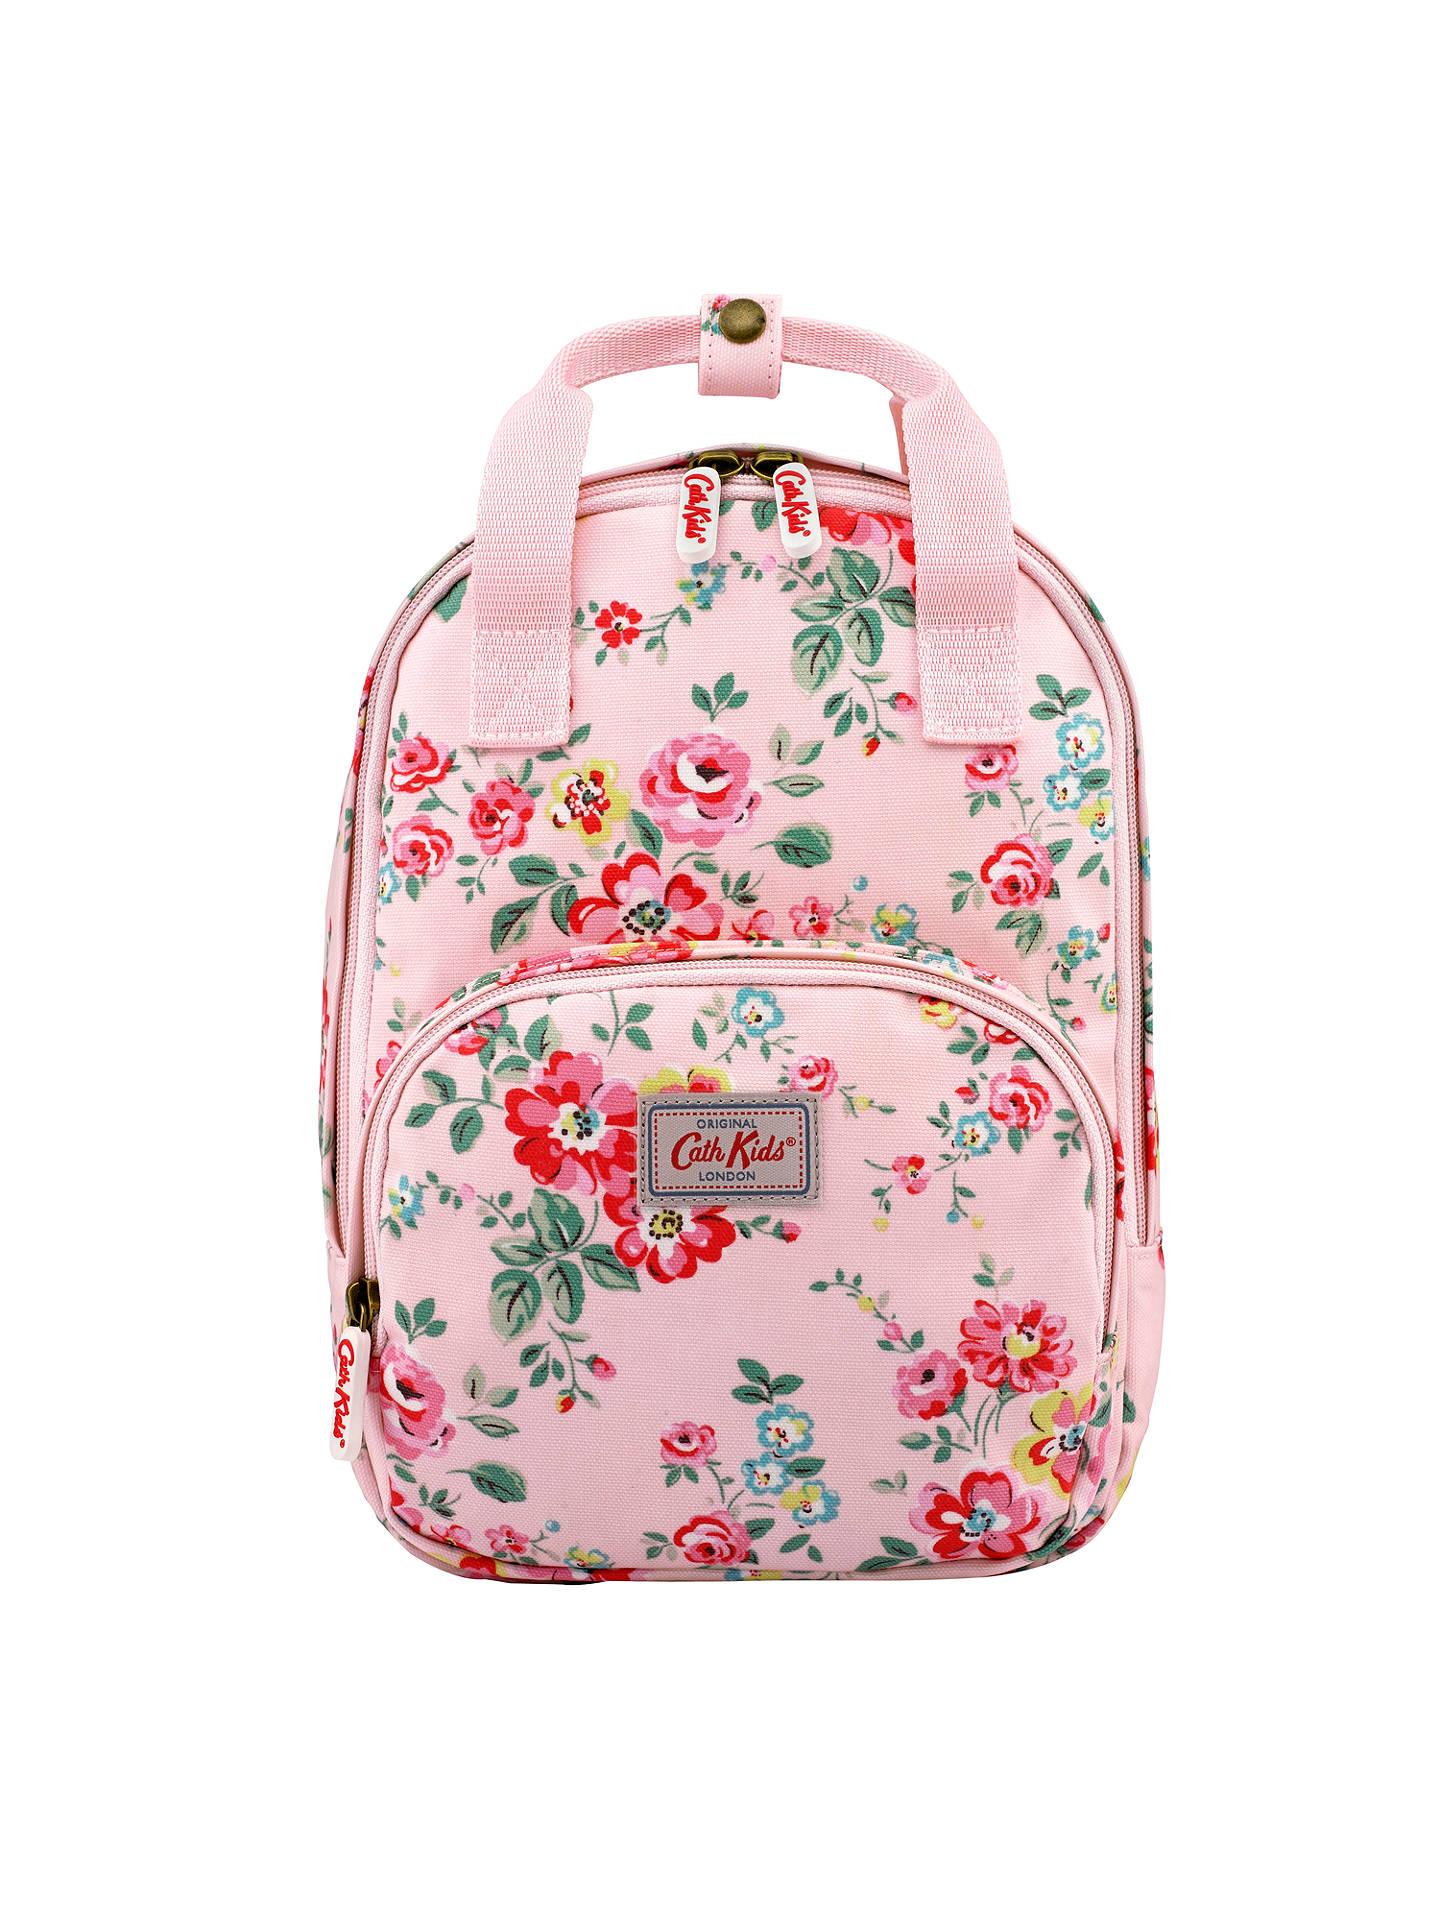 cd0db2175d Buy Cath Kidston Children's Medium Floral Backpack, Pale Pink Online at  johnlewis.com